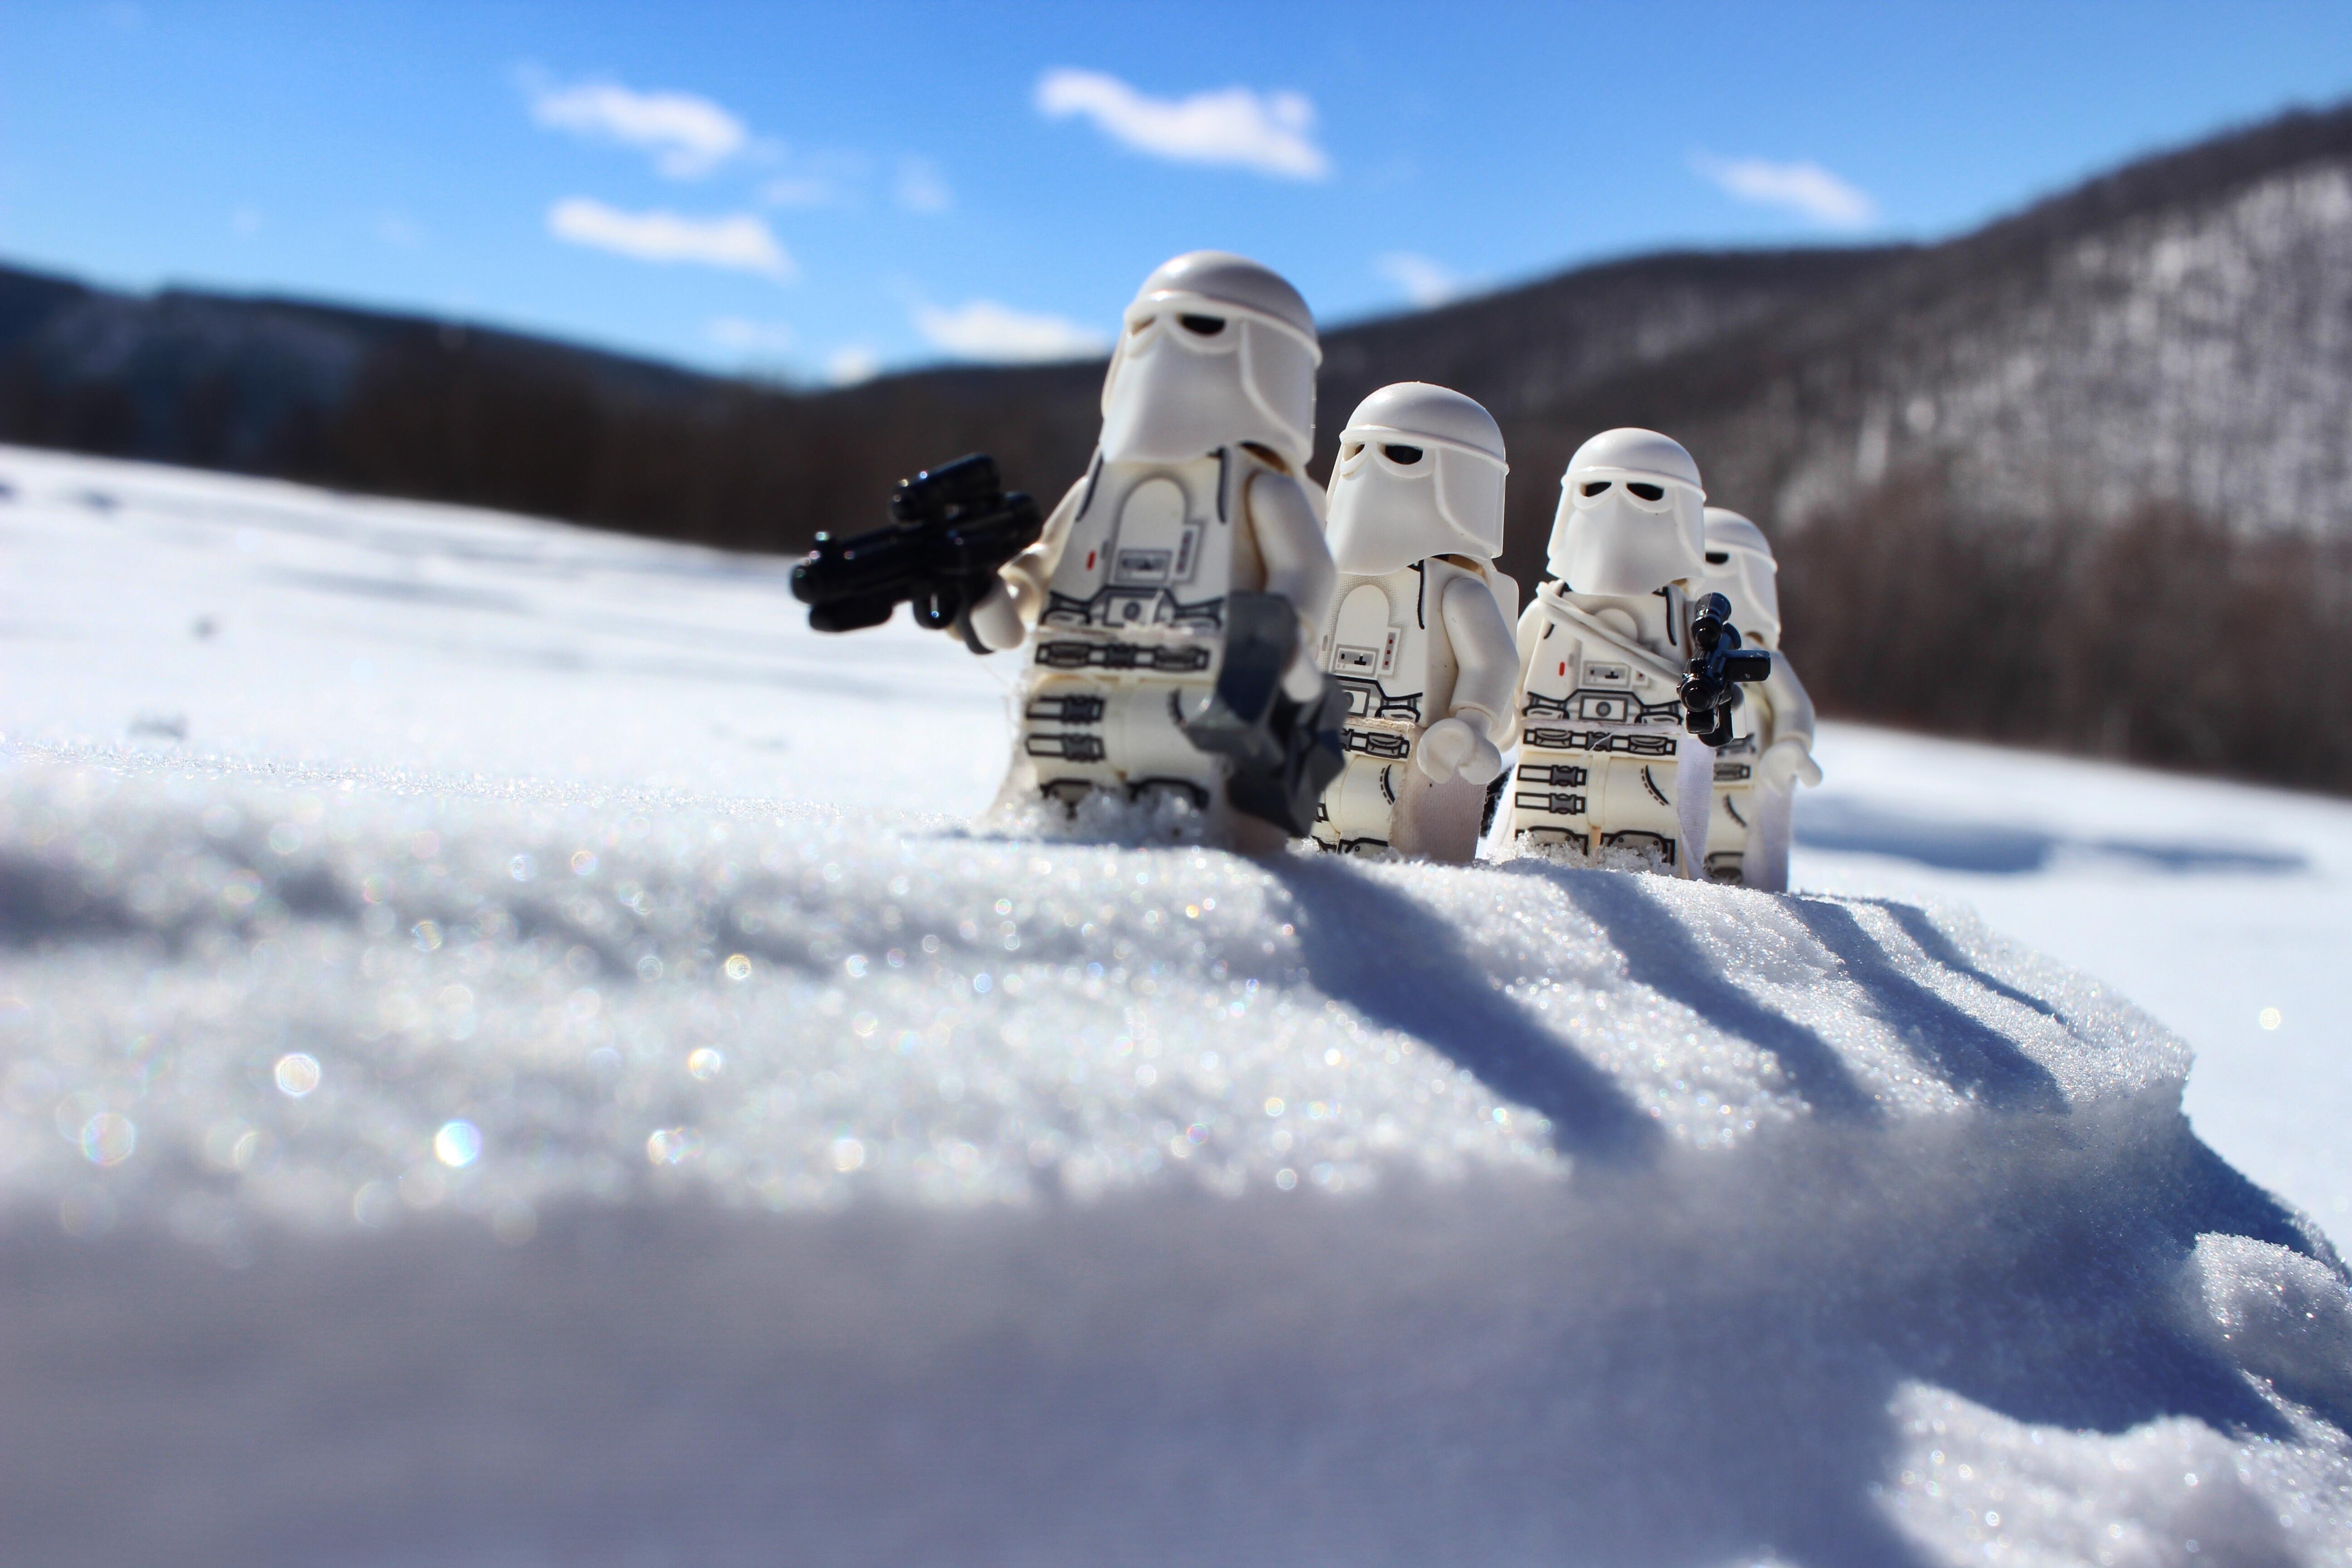 Wallpaper Lego Legography Starwars Snowtrooper Snow Stormtrooper 5184x3456 928555 Hd Wallpapers Wallhere